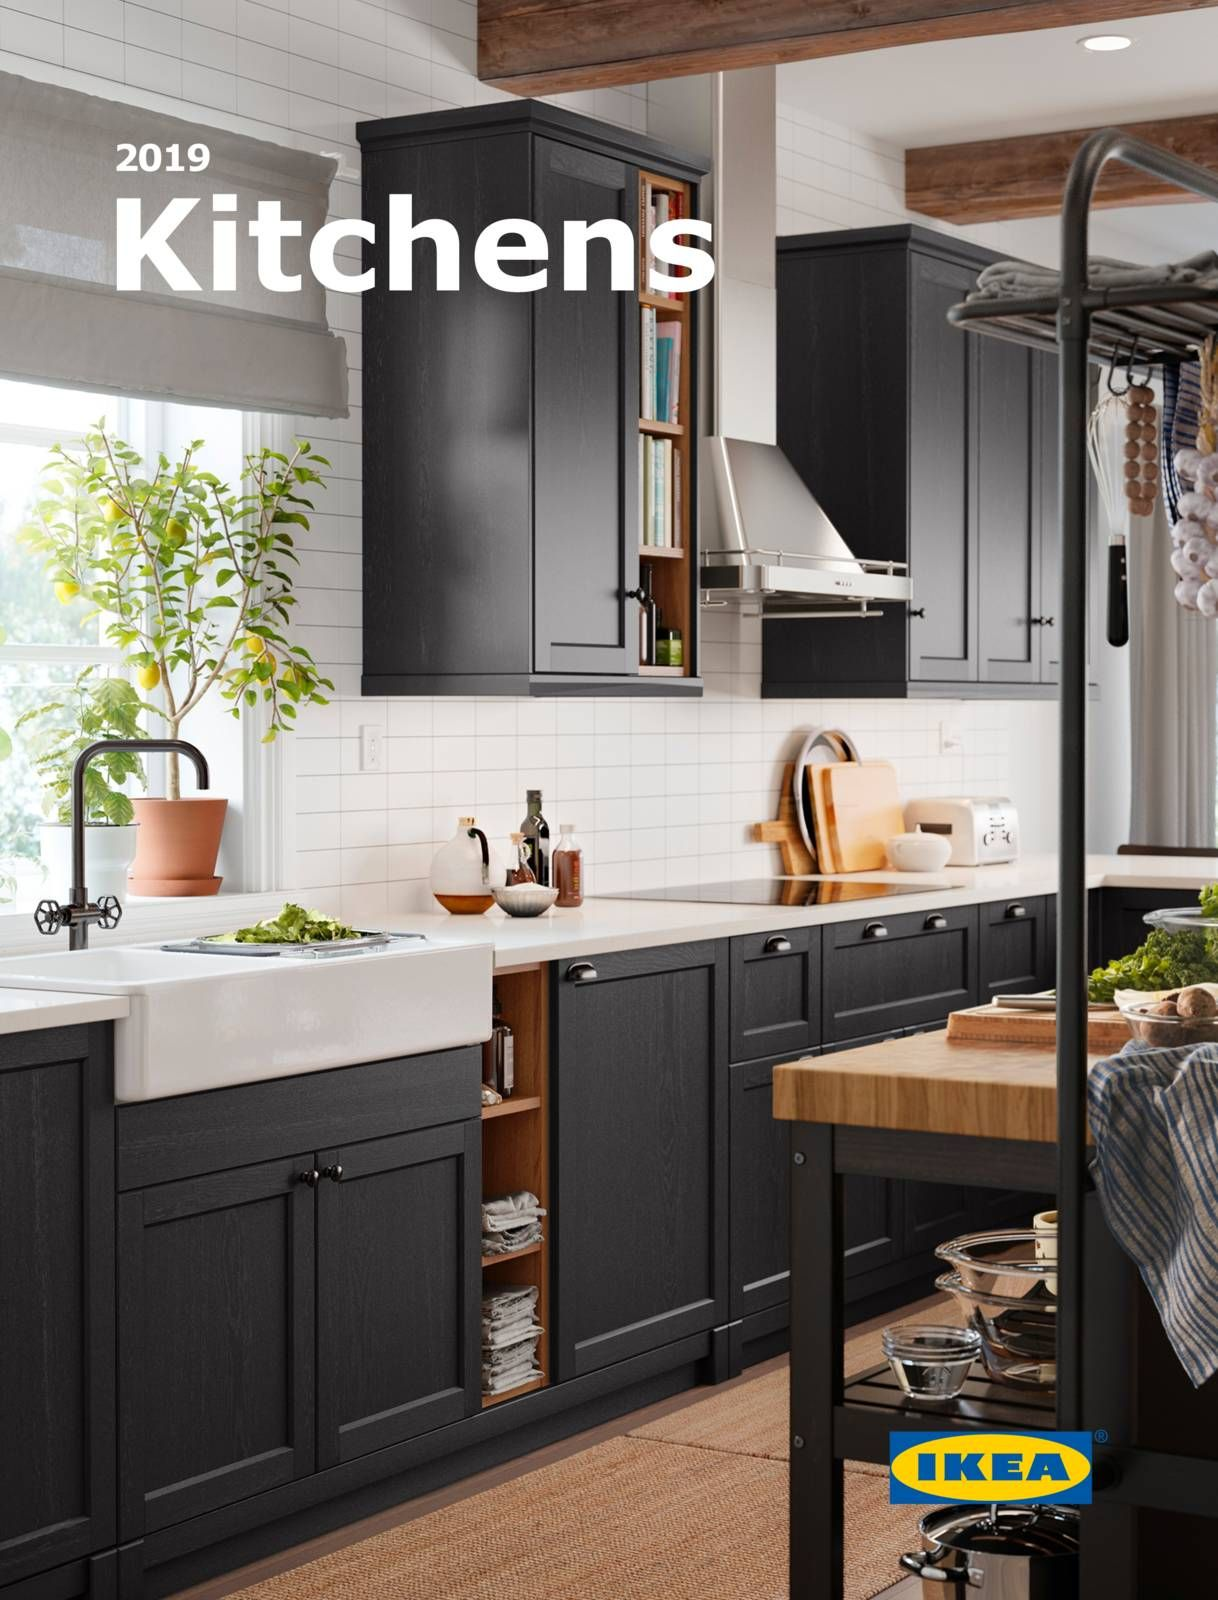 Kitchens 2019 Ikea Kitchen Brochure 2019 Diy In 2019